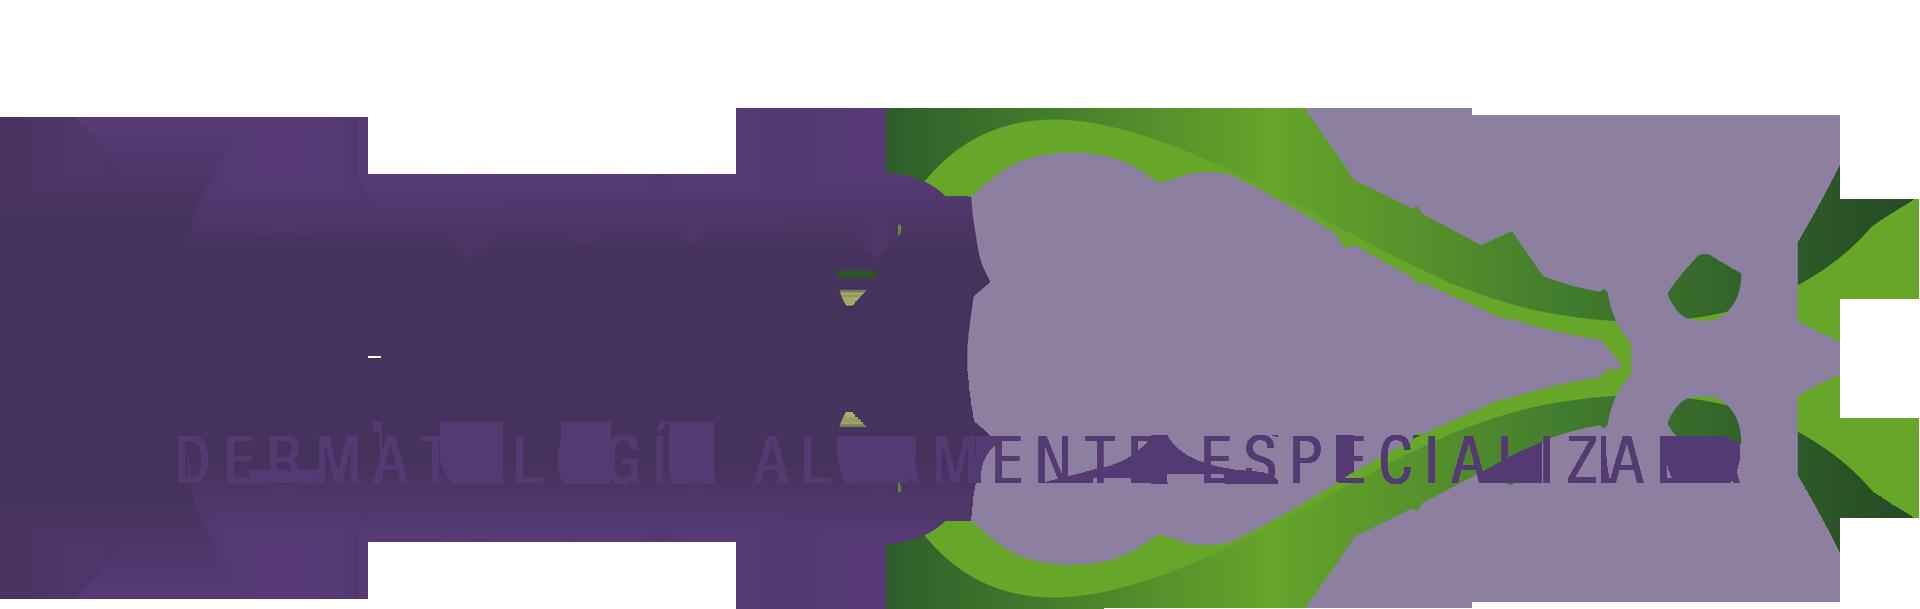 logo Dermosalud